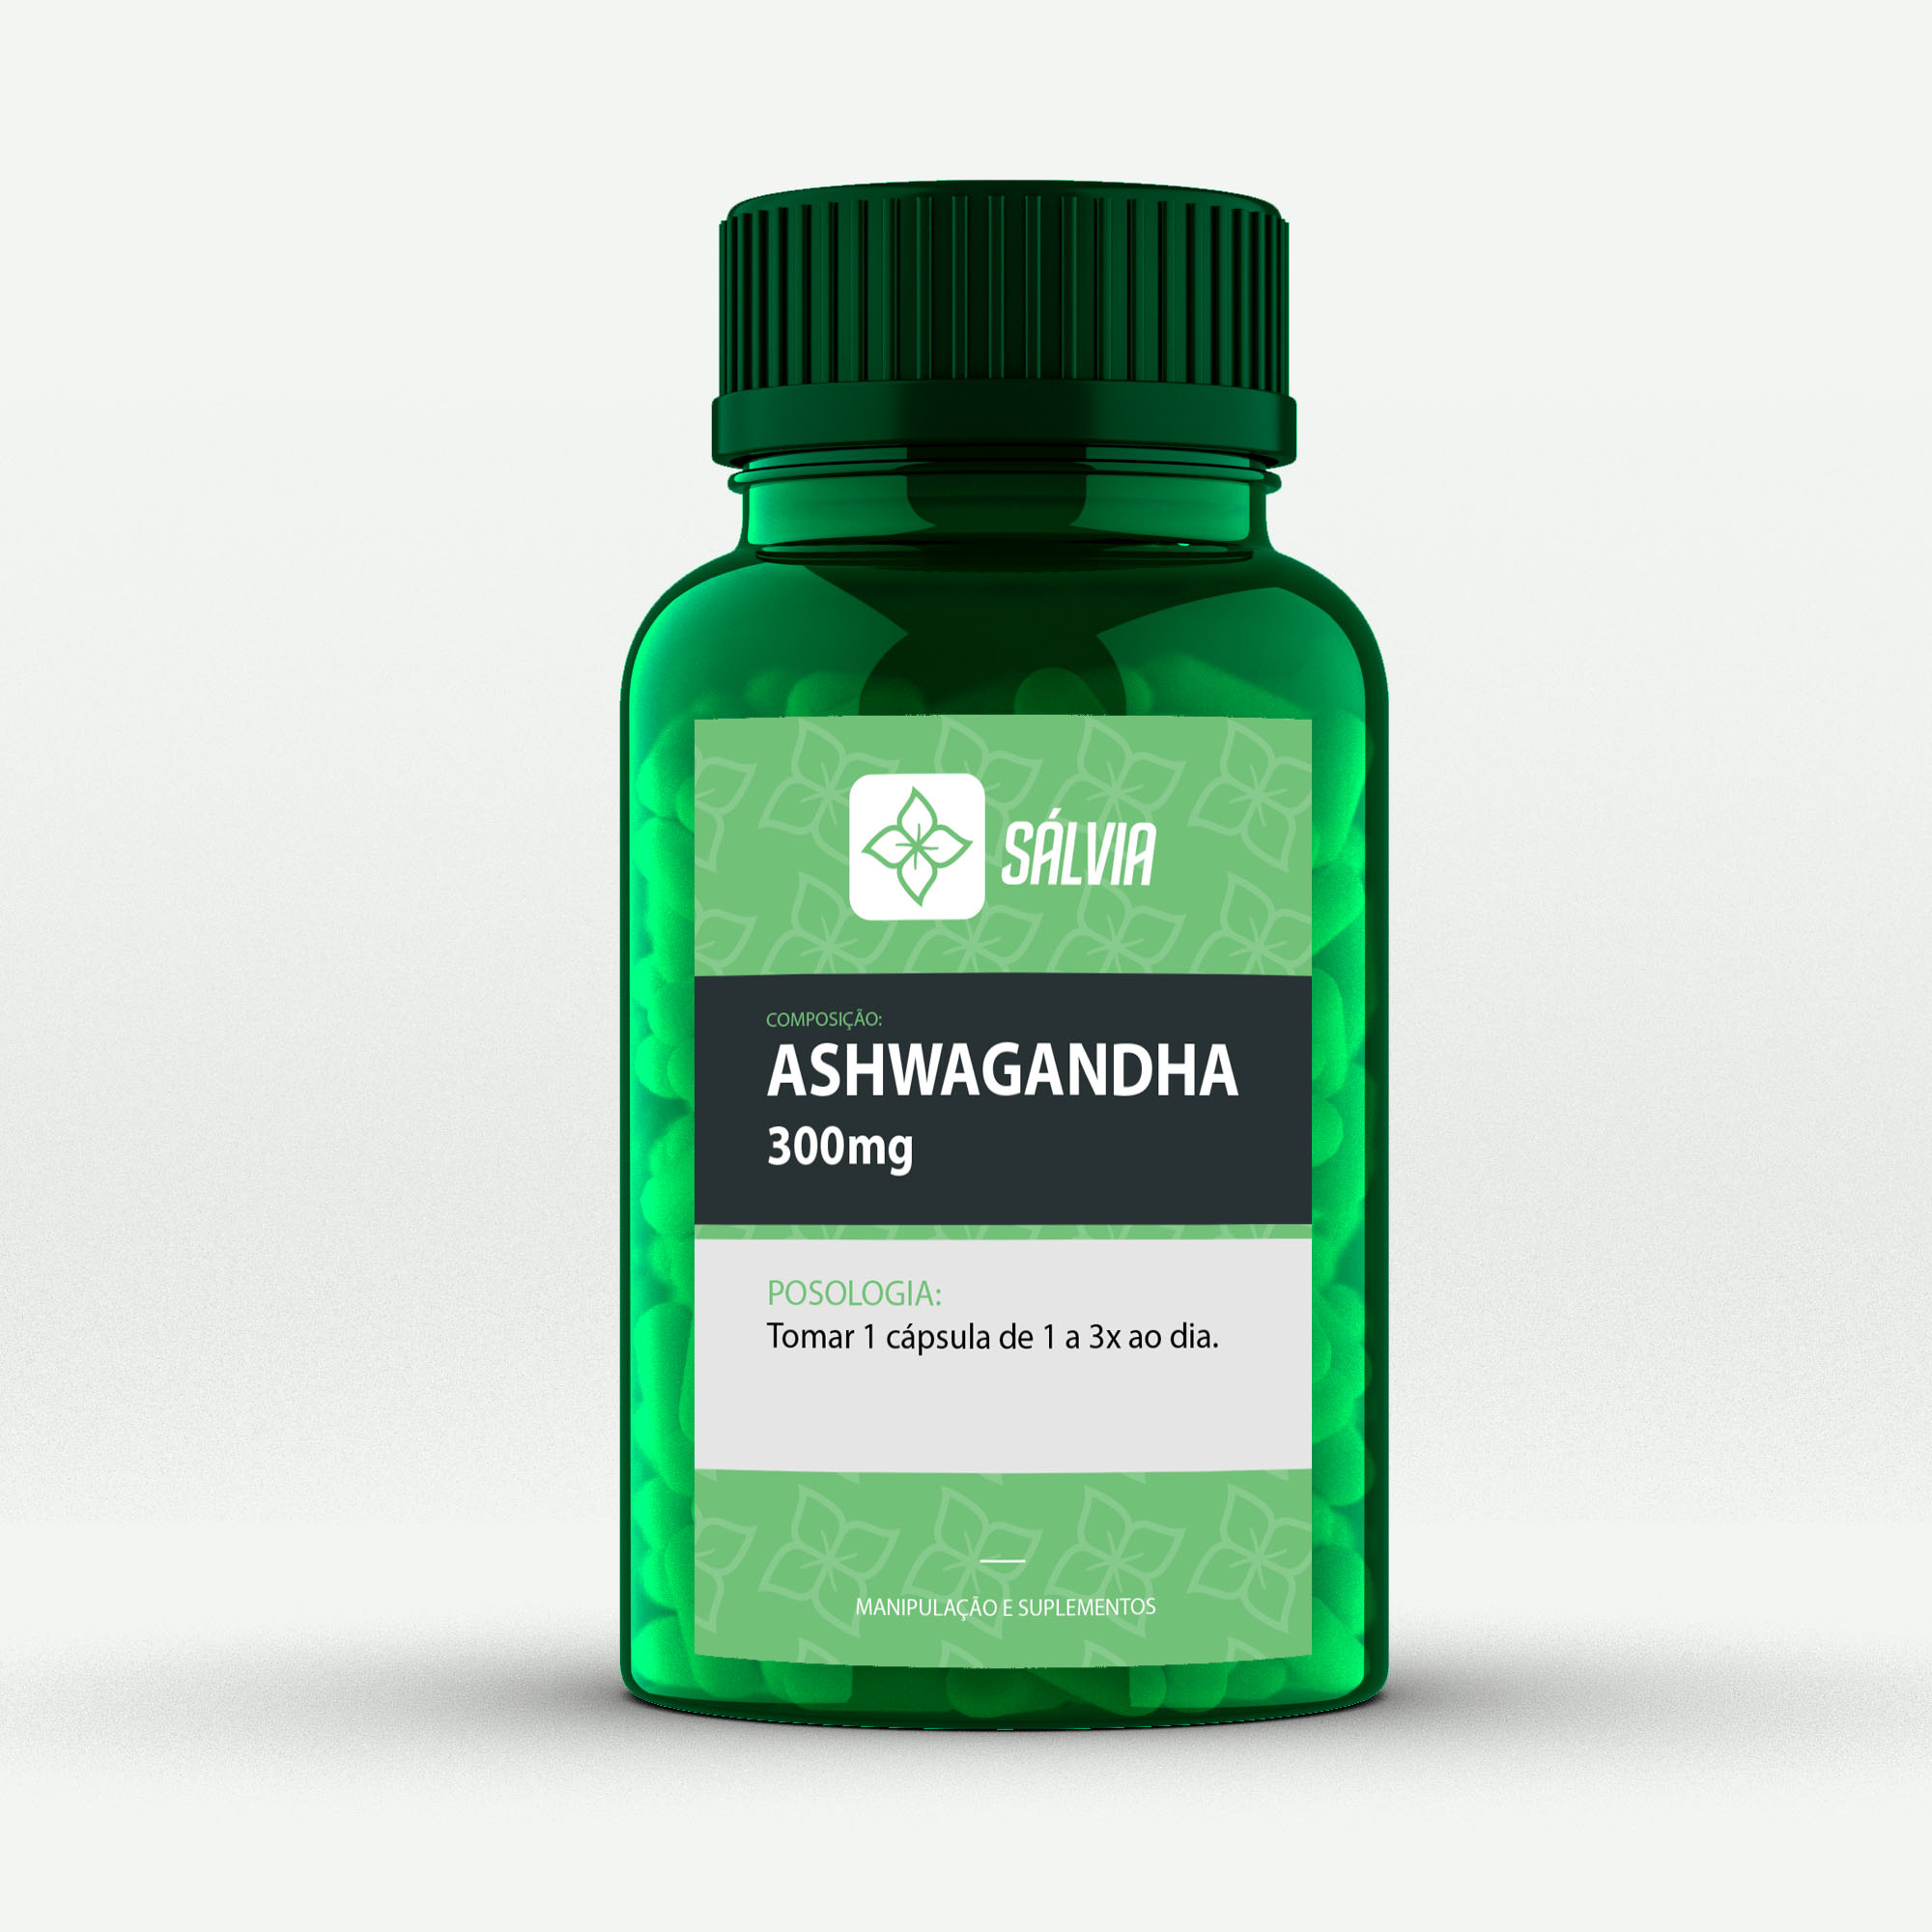 ASHWAGANDHA (Ginseng Indiano) 300mg - Cápsulas